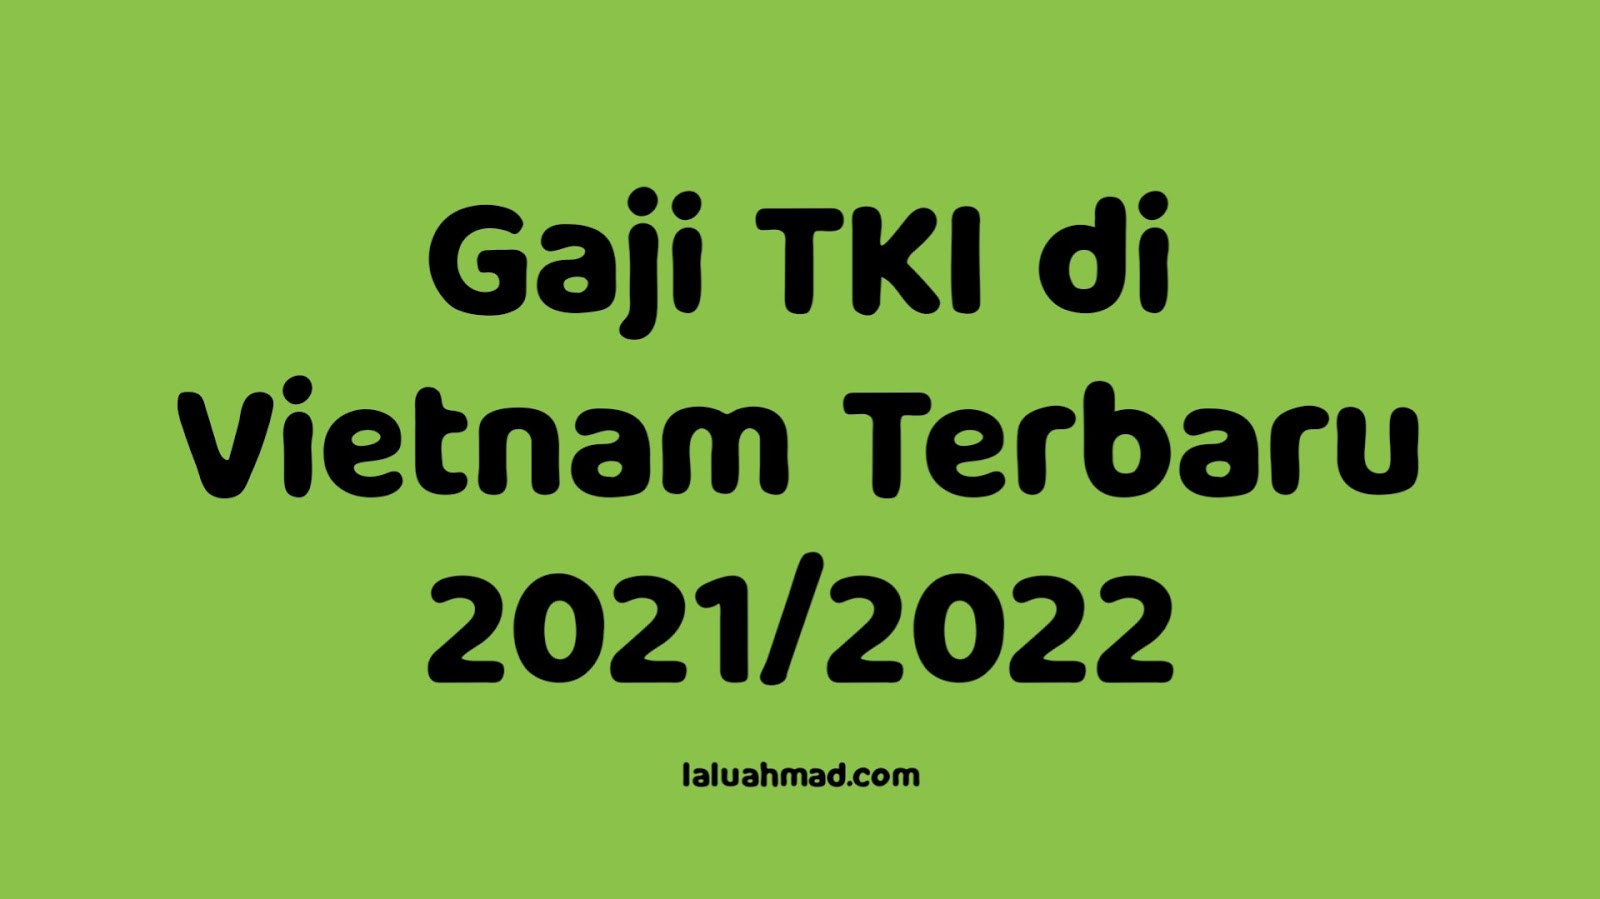 Gaji TKI di Vietnam Terbaru 2021/2022